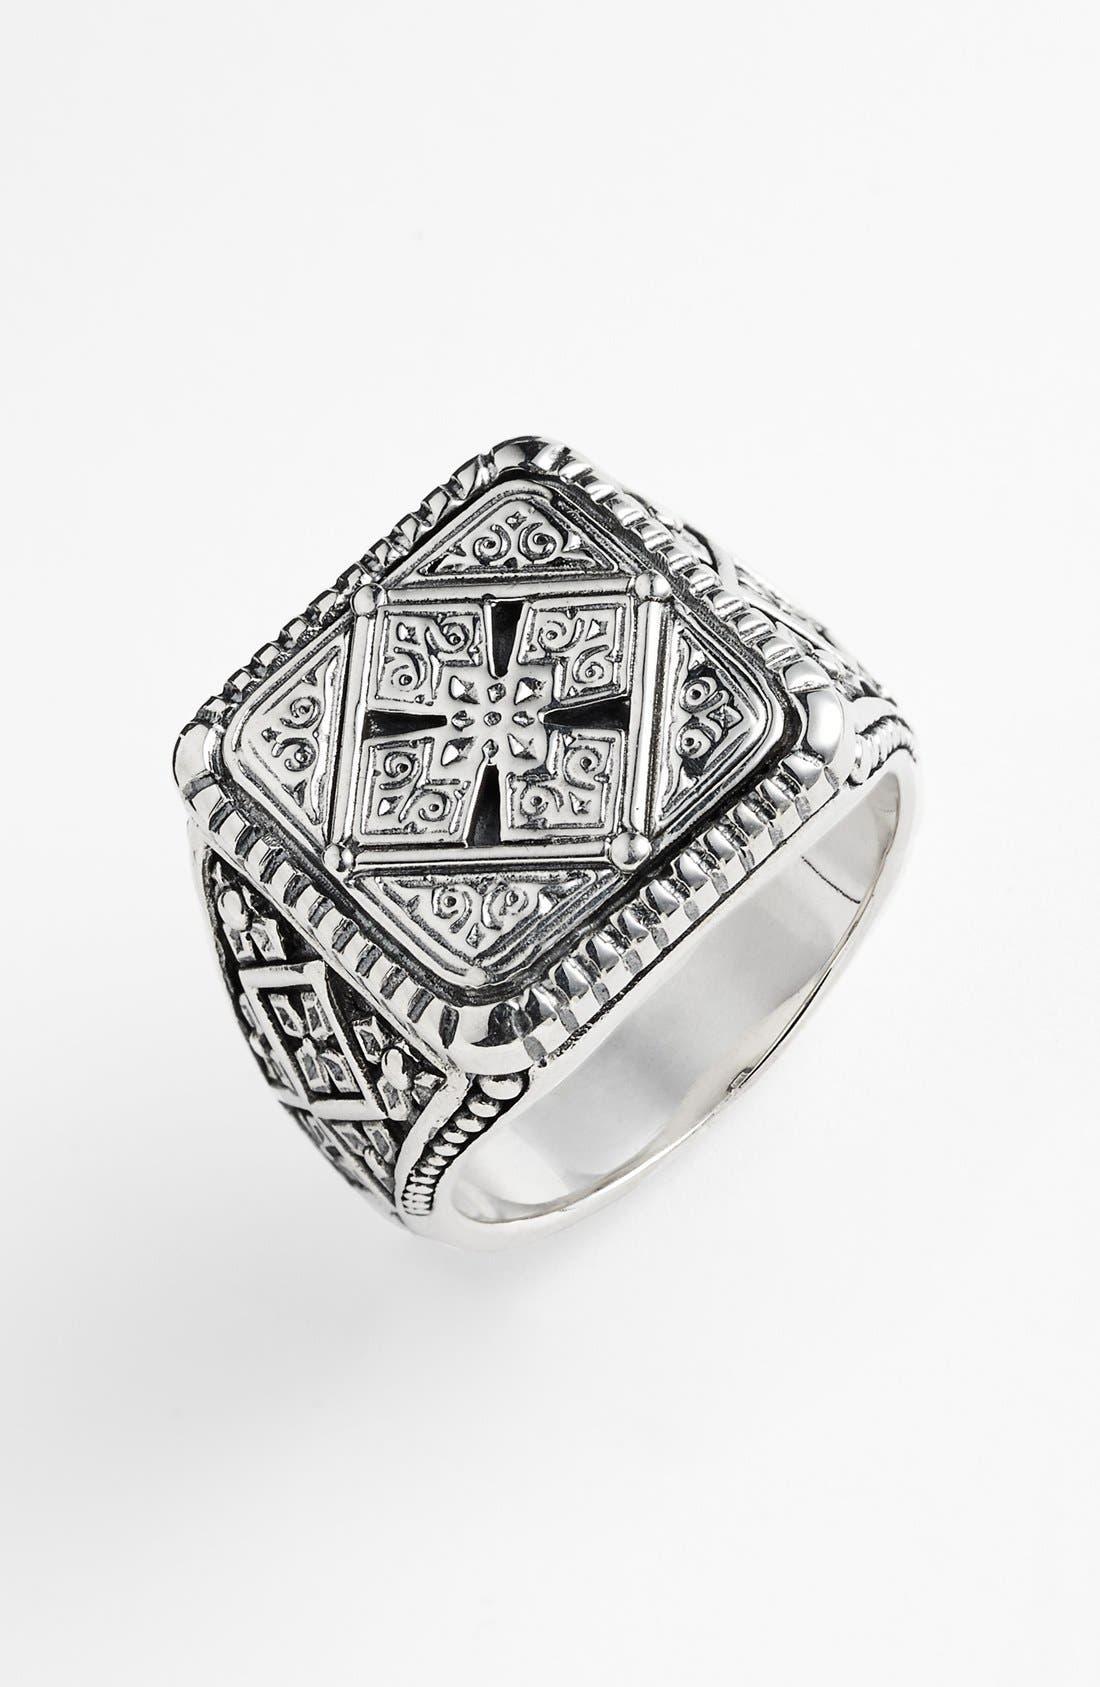 Main Image - Konstantino 'Classics' Cross Square Ring